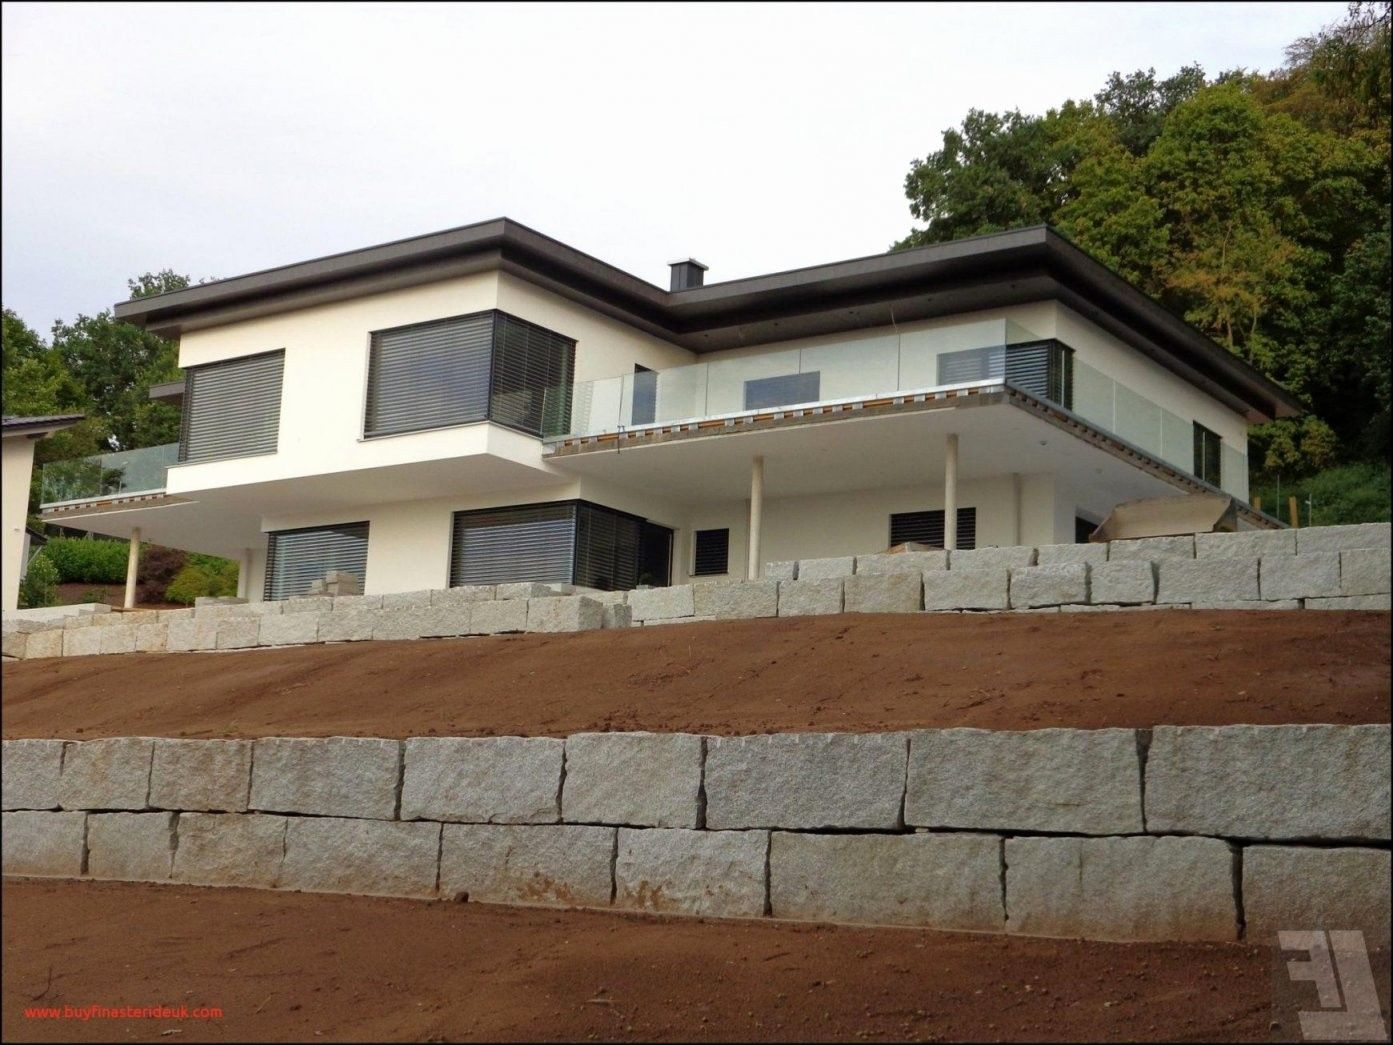 Bungalow Selber Bauen Kosten Elegant Haus Aus Container Preis von Bungalow Selber Bauen Kosten Bild